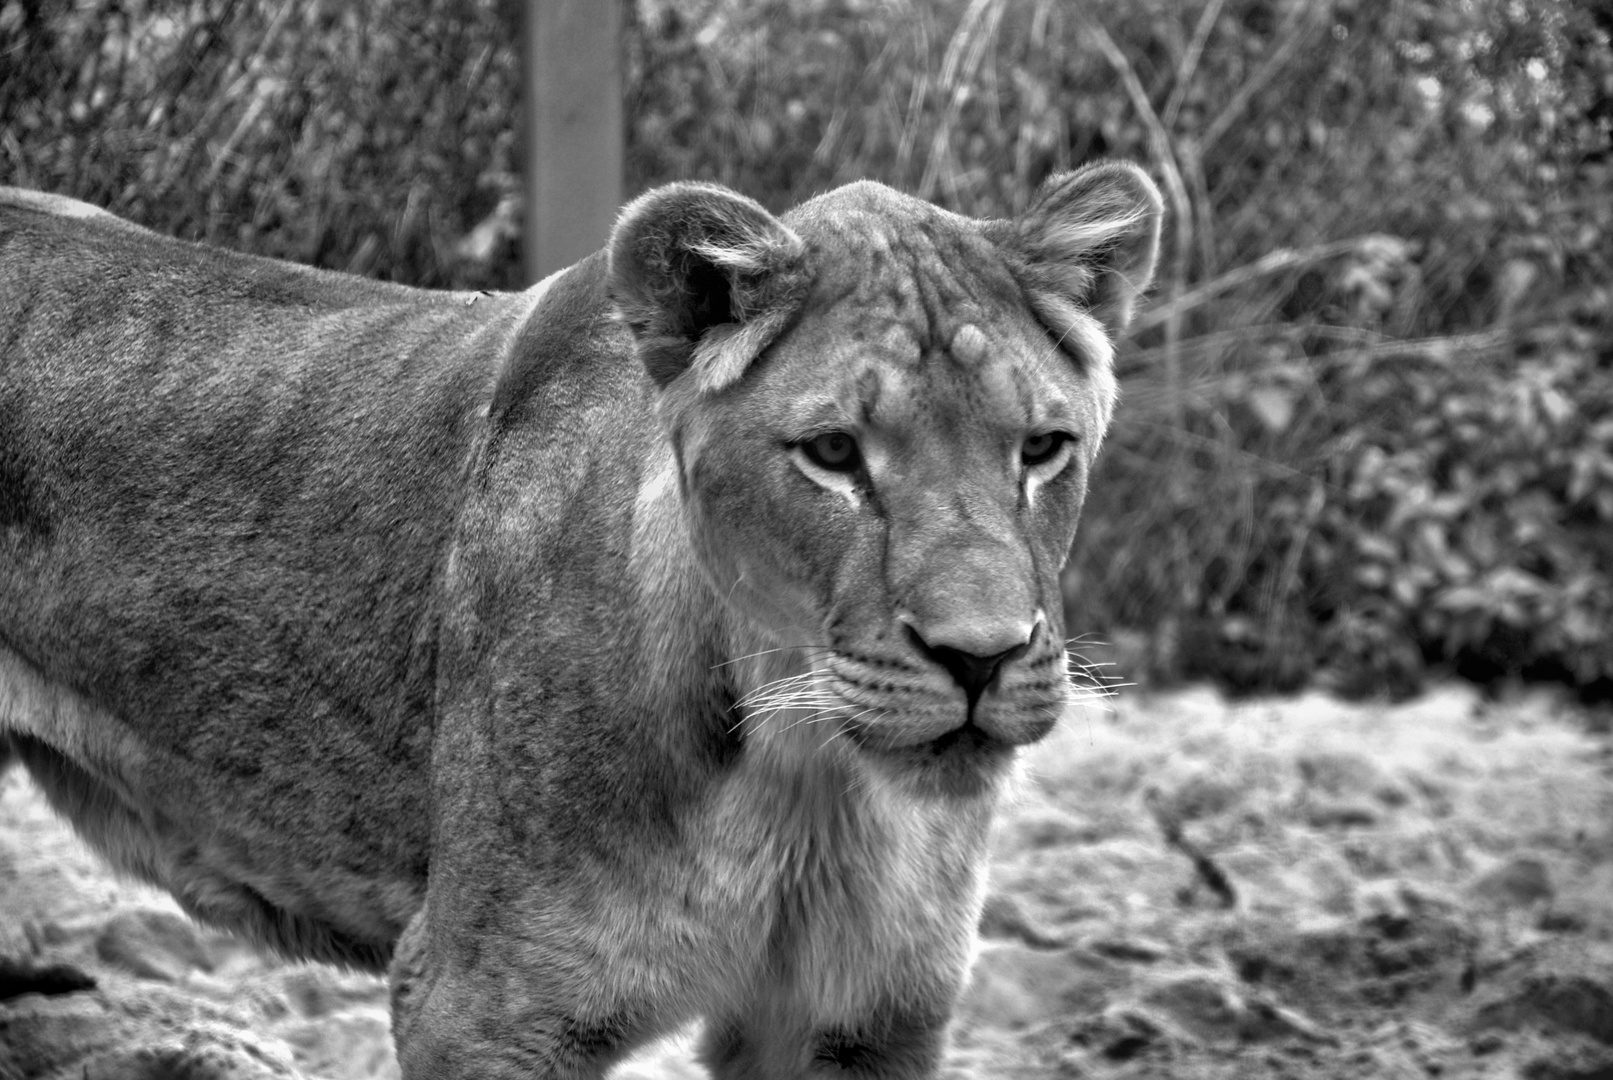 Löwin im Dresdener Zoo